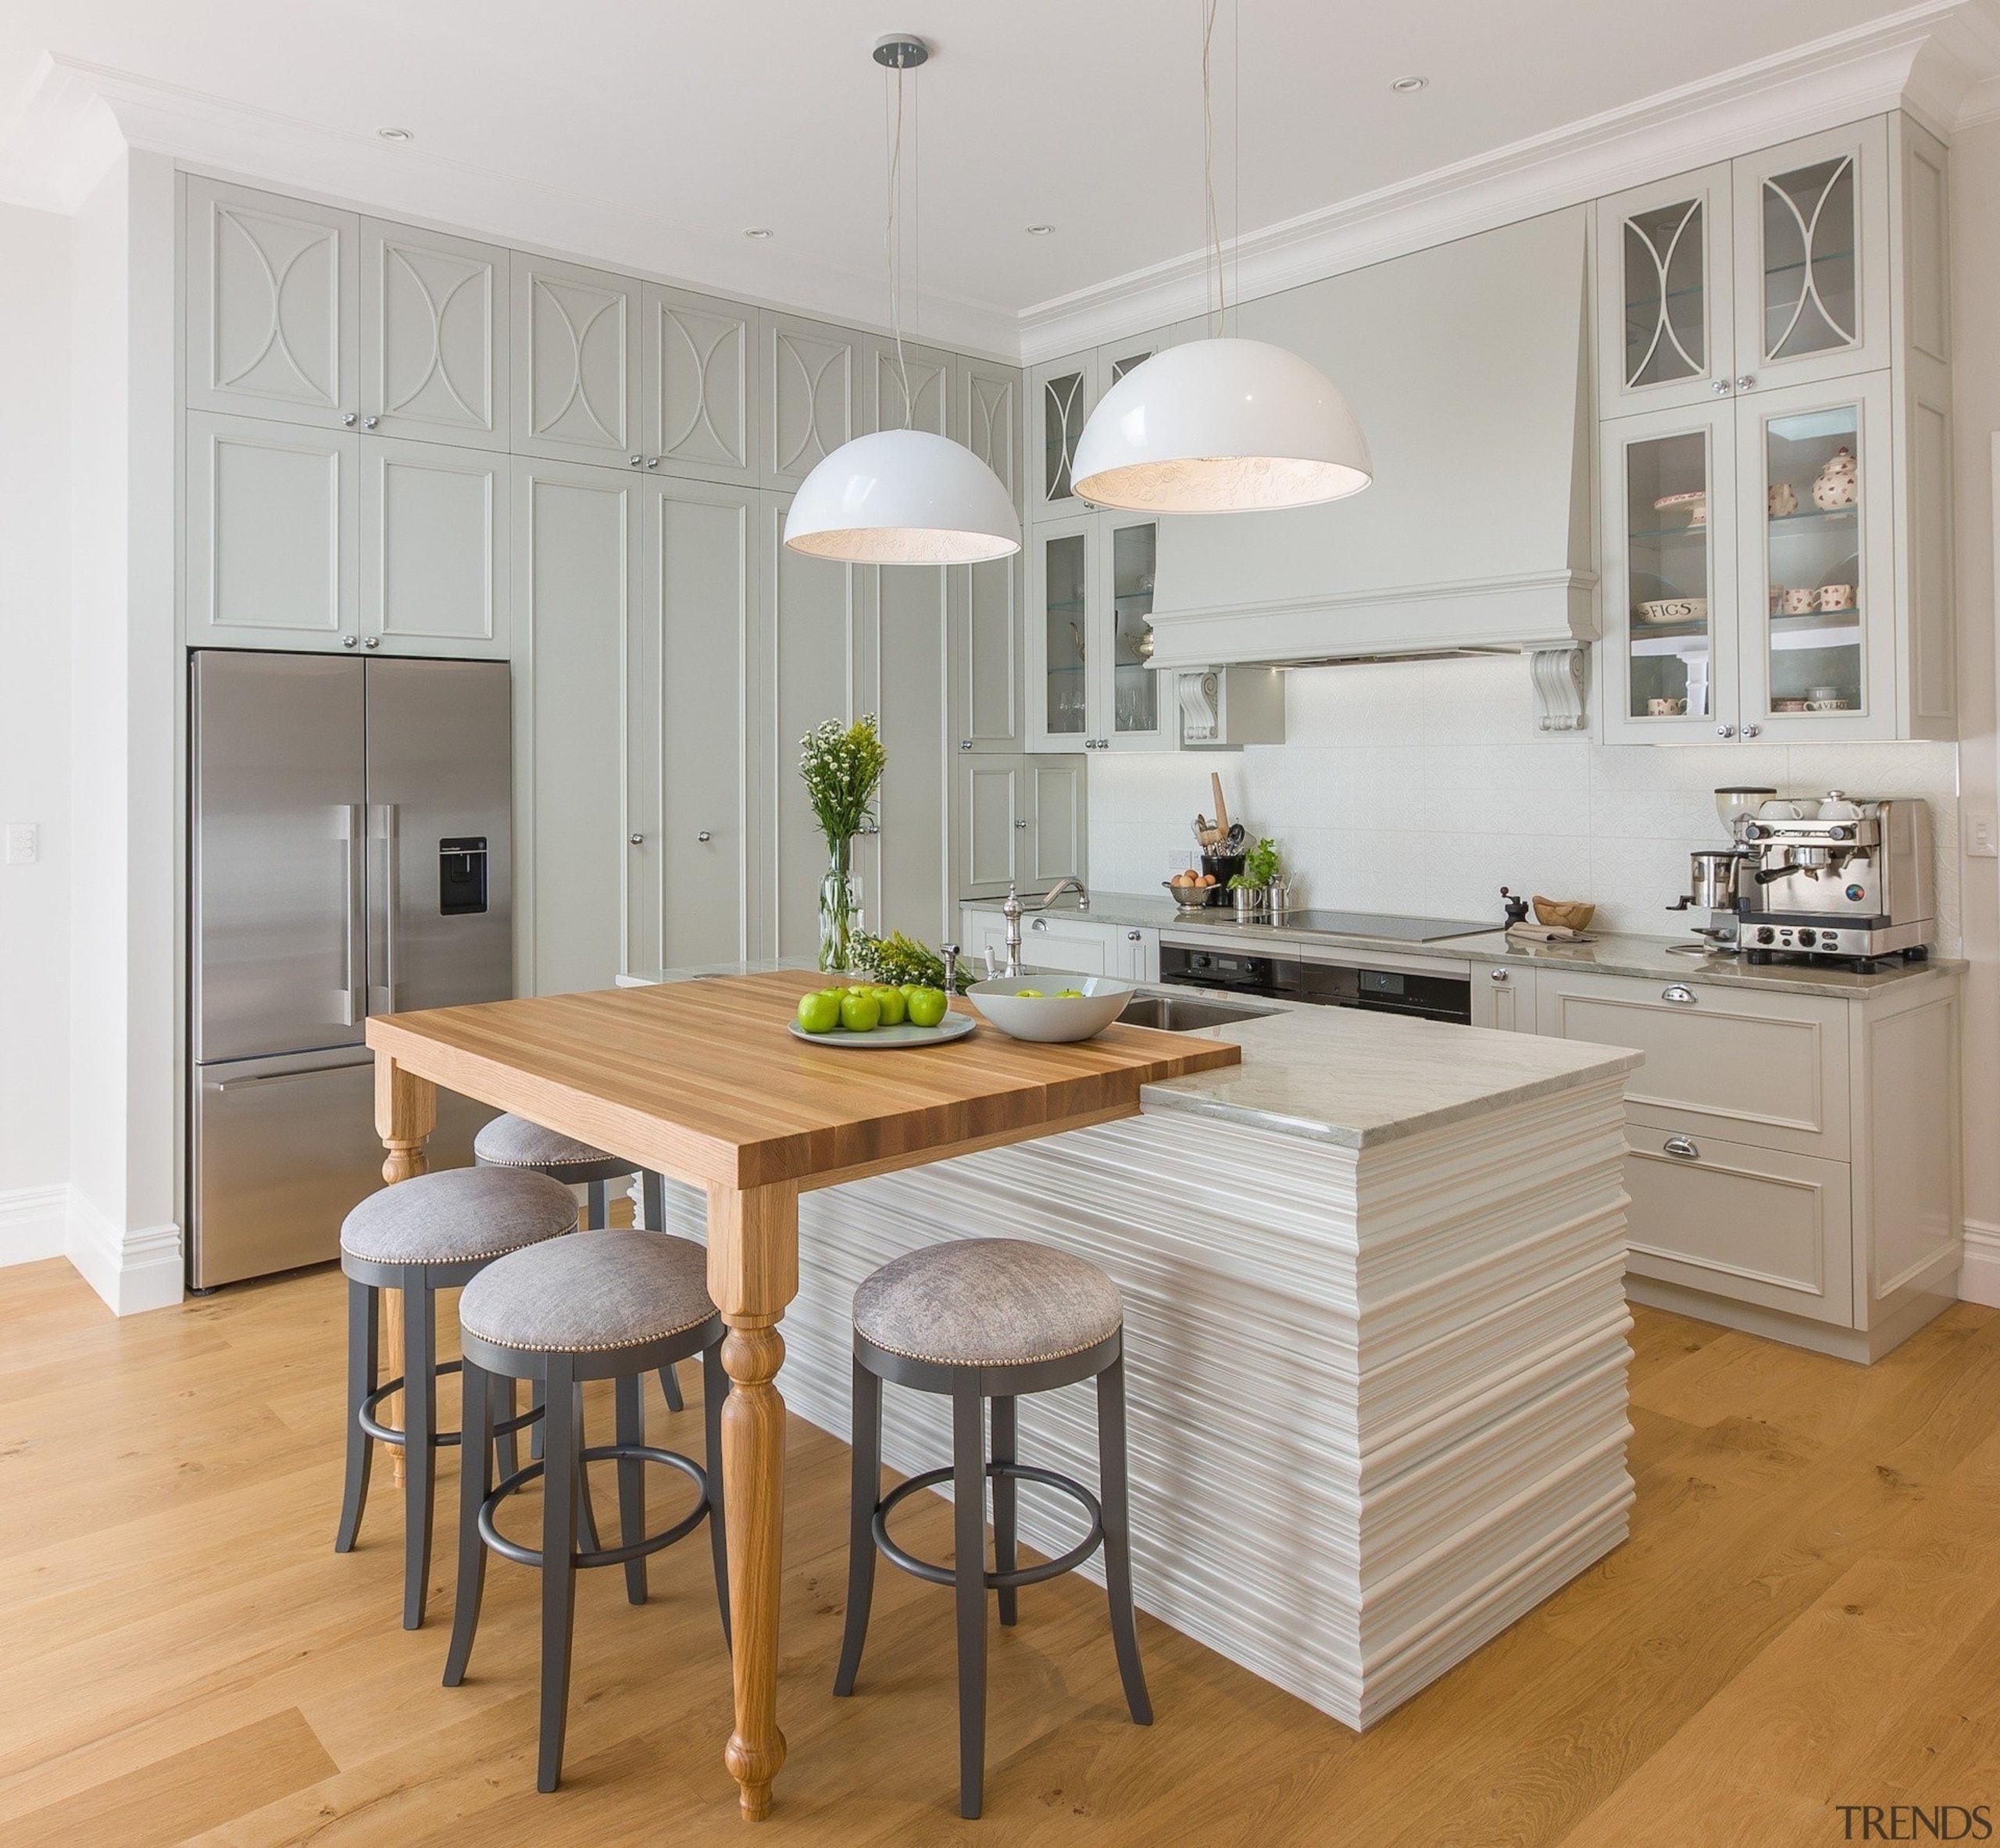 Du Bois Design – TIDA New Zealand cabinetry, countertop, cuisine classique, floor, flooring, furniture, interior design, kitchen, laminate flooring, room, table, wood flooring, gray